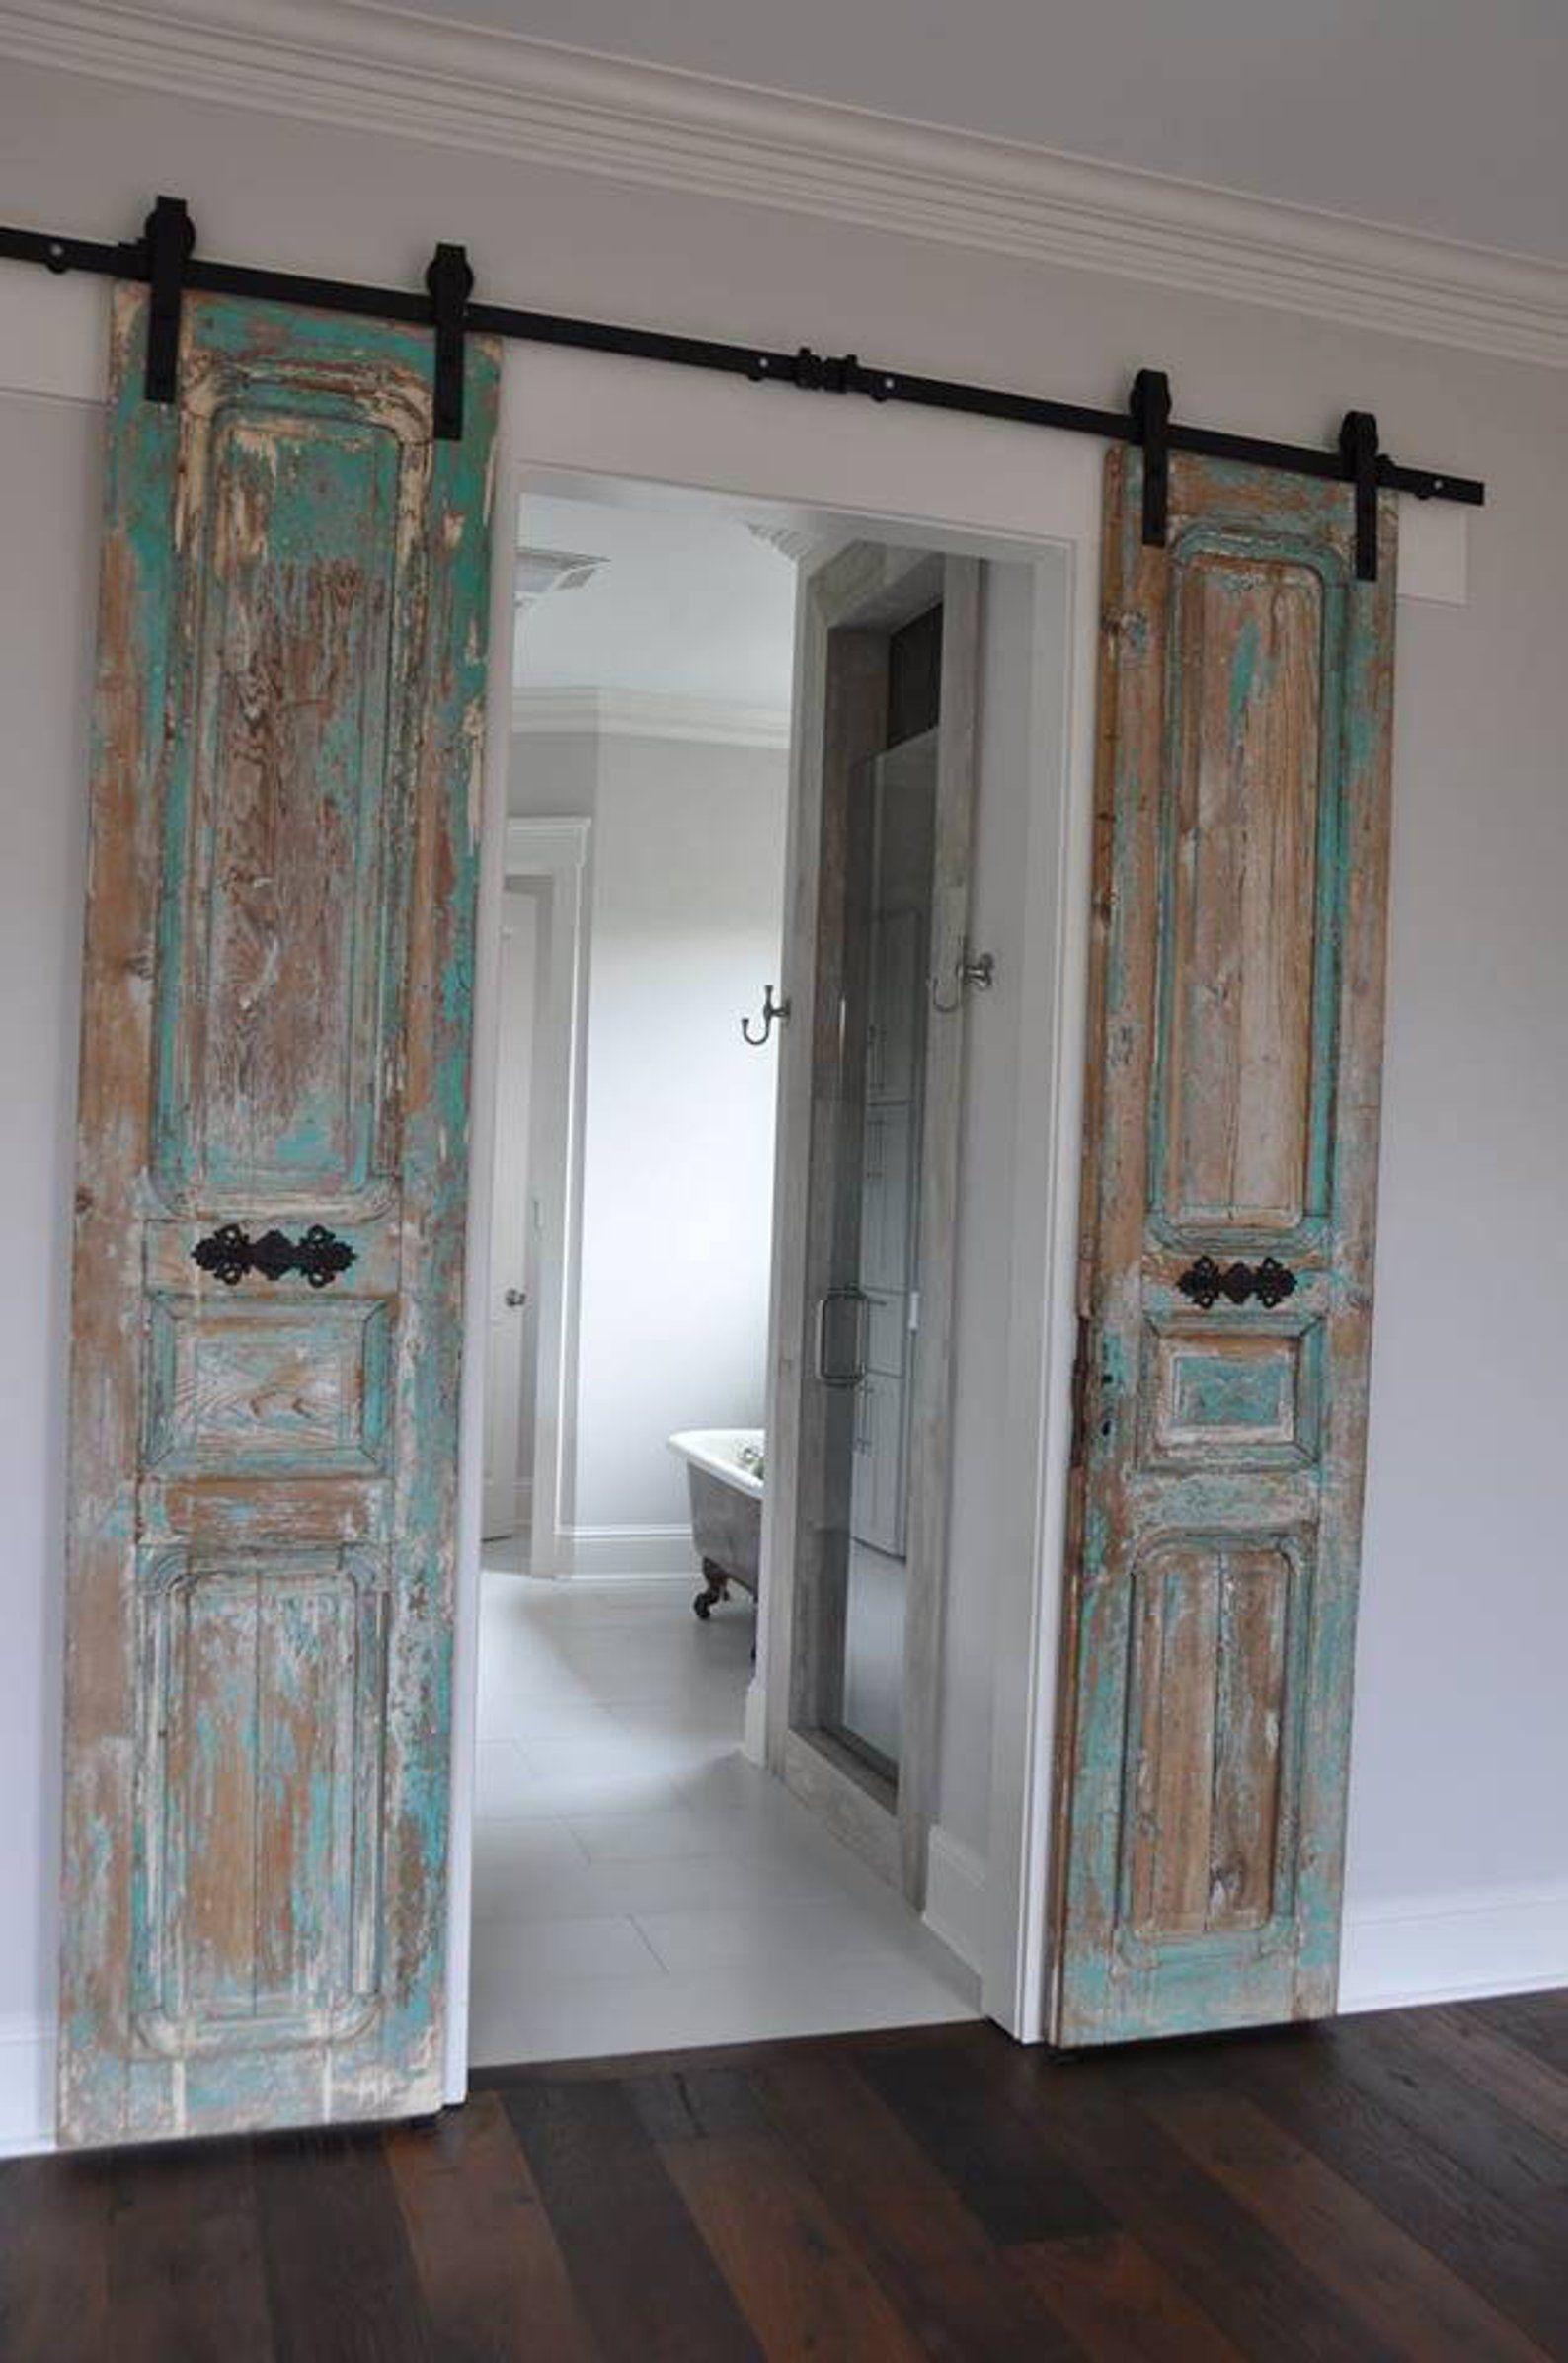 Vintage Door Vintage Doors Barn Door Barn Doors Found By Foo Foo La La Inside Barn Doors Vintage Door Vintage Doors